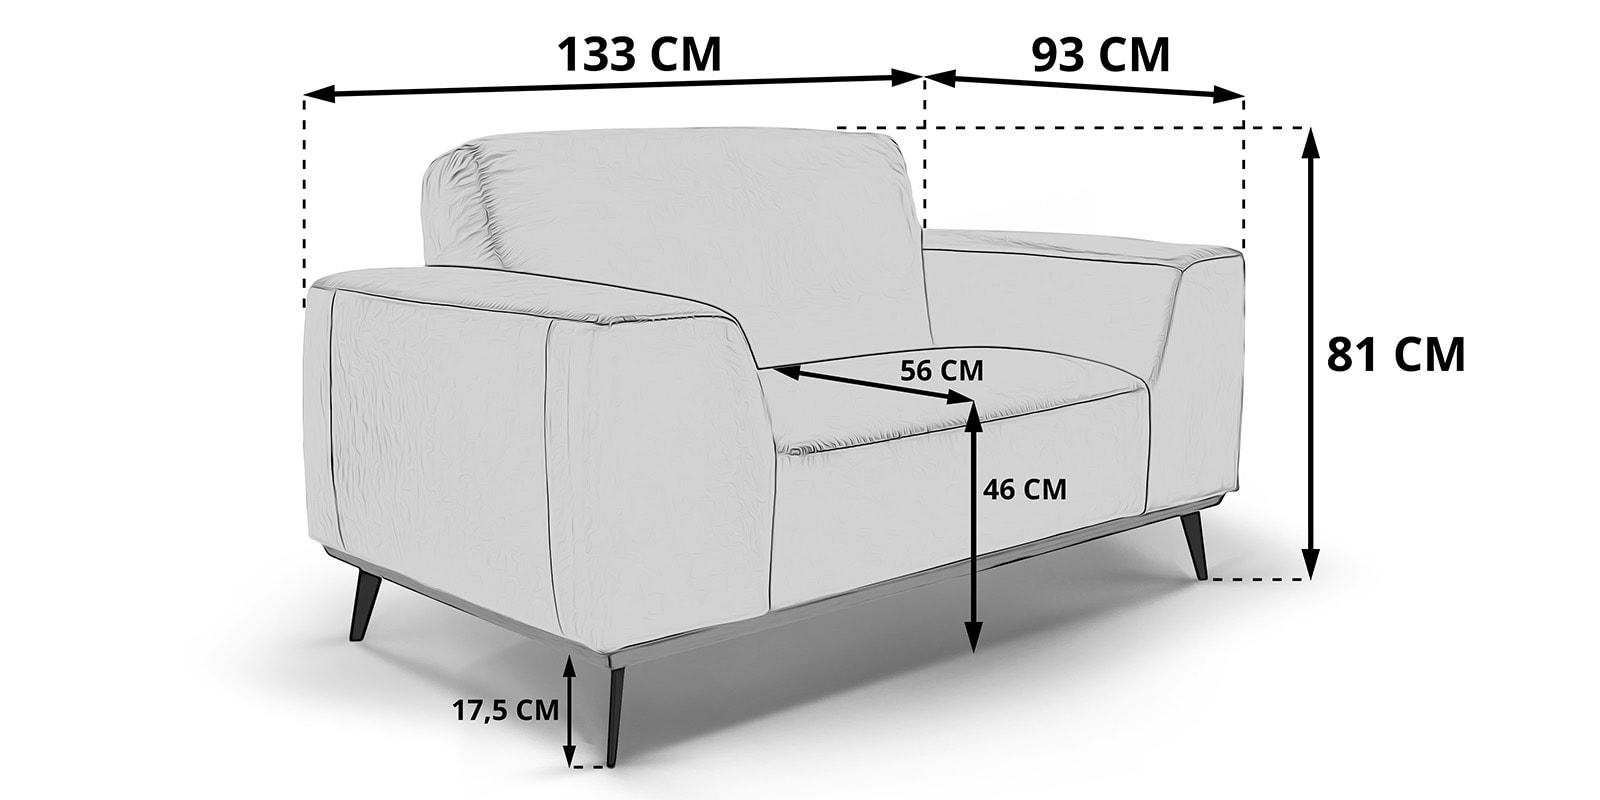 Moebella24 - 1-Sitzer - Sessel - Sofa - Barcelona - Leder - Skizze - Maße - Skandinavisches - Design - Punto - cavallo - Nähte -